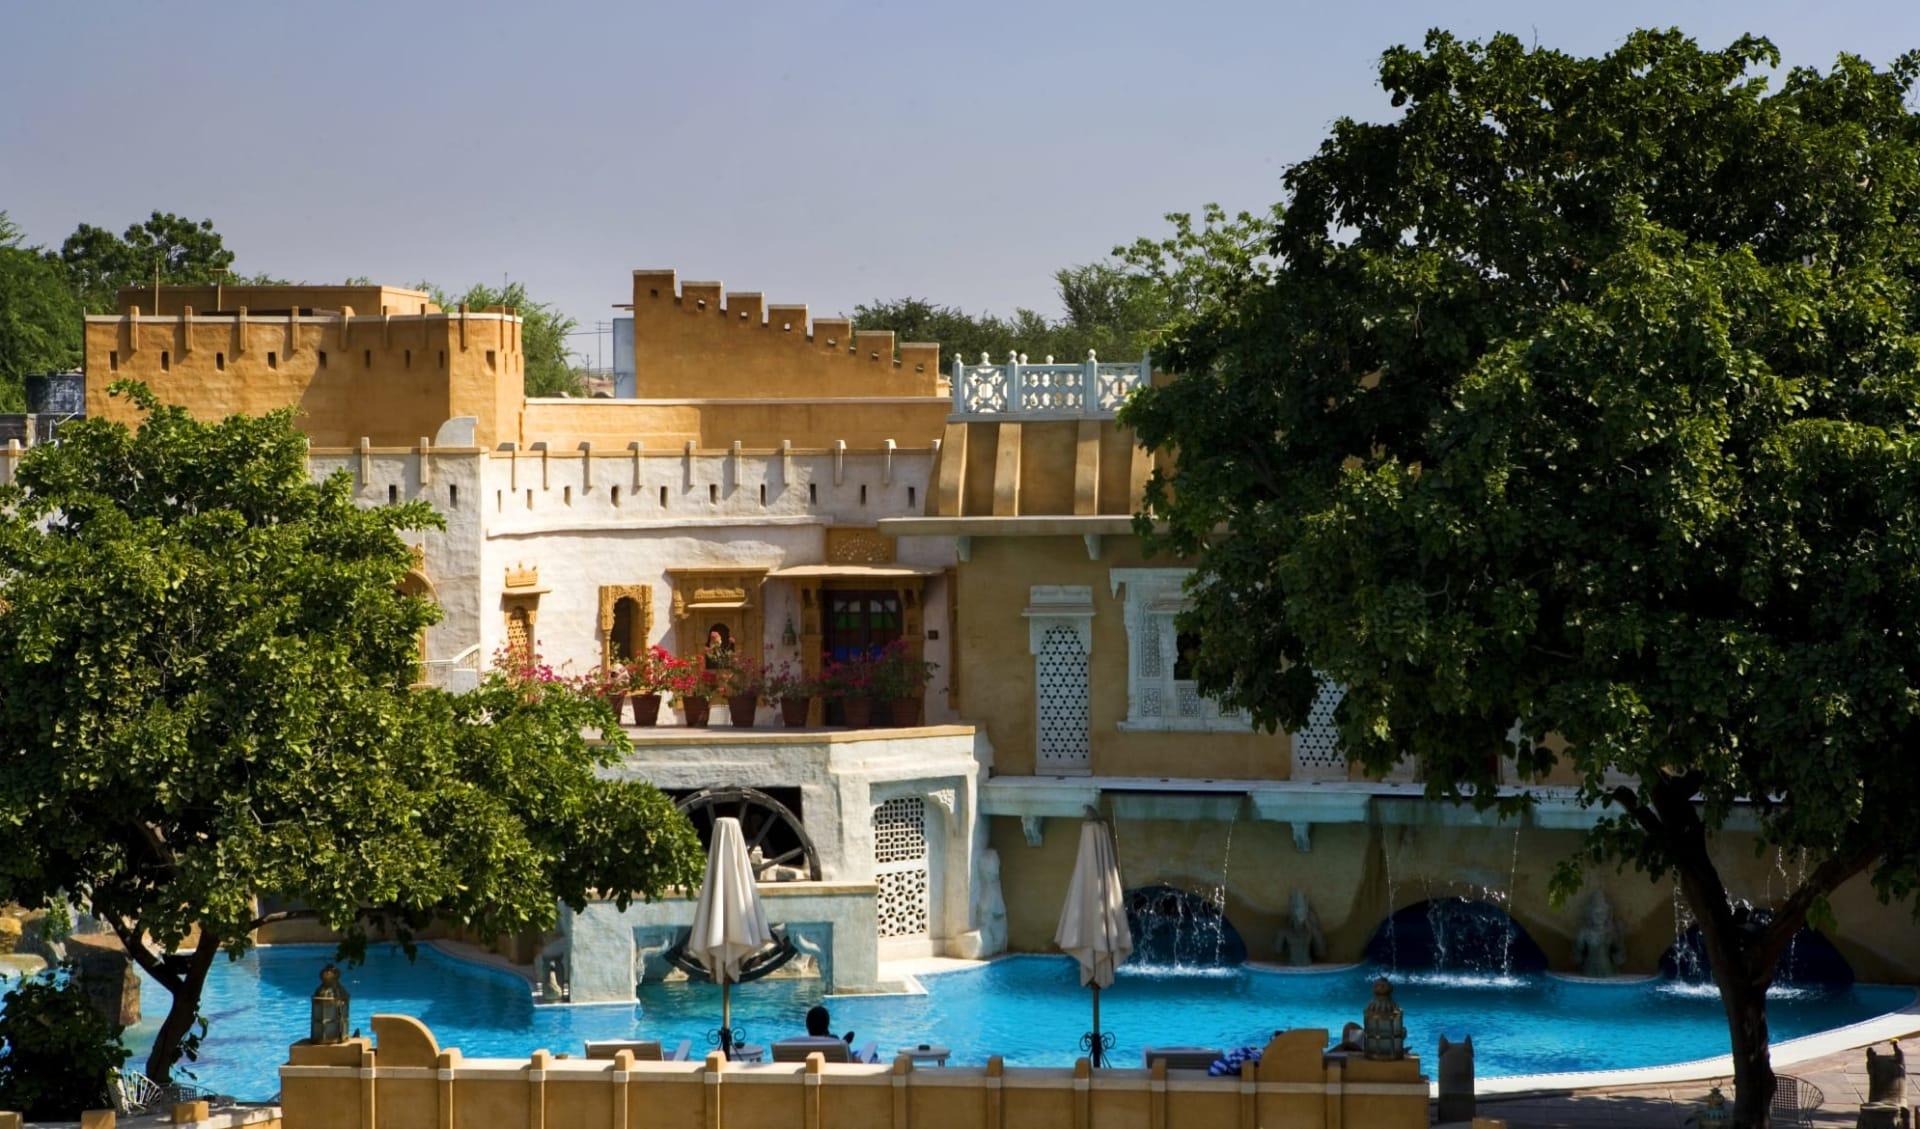 The Ajit Bhawan in Jodhpur: